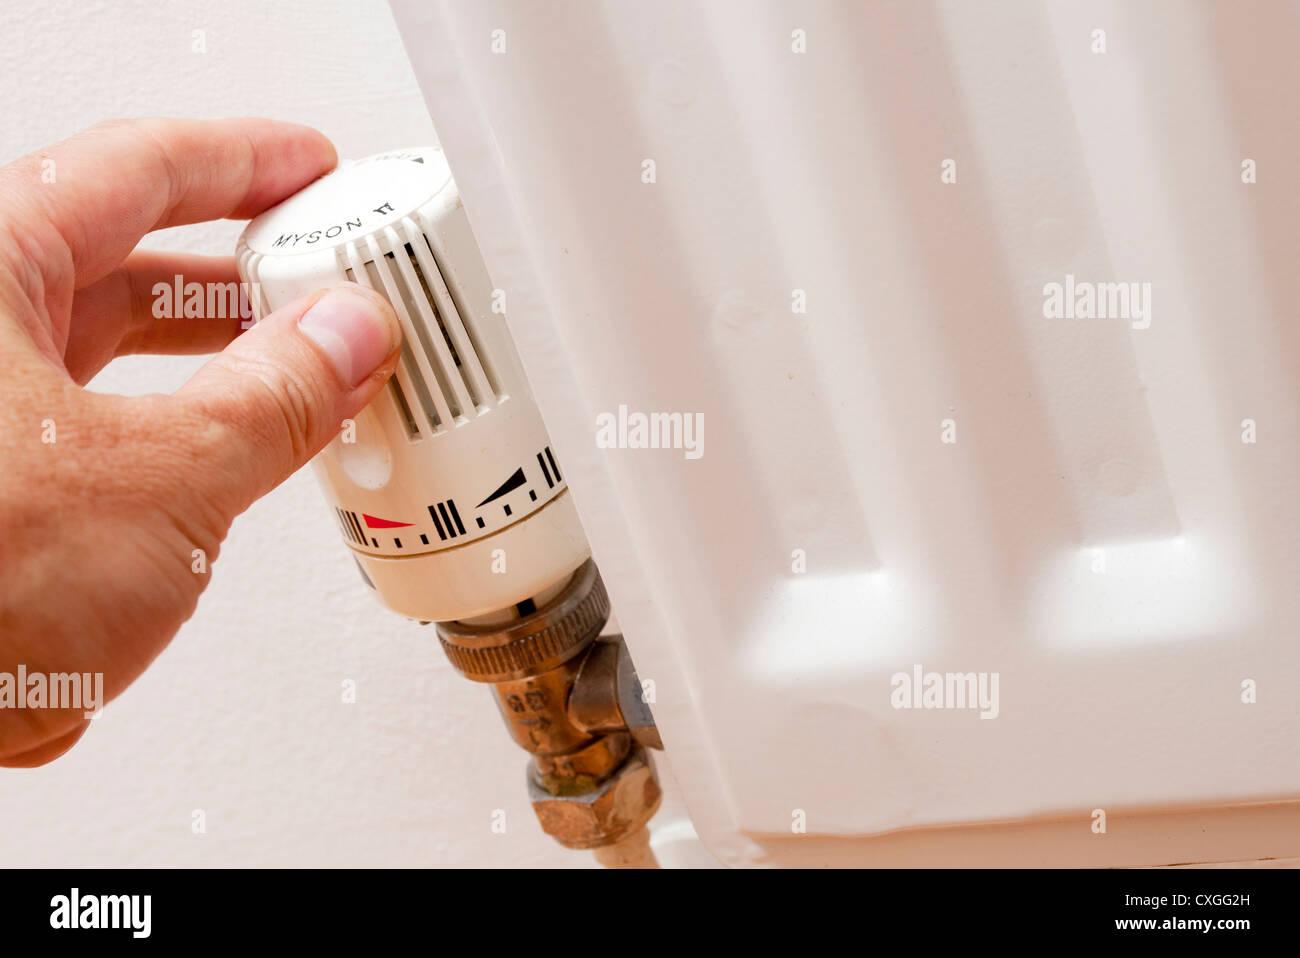 temperature control valve on a radiator - Stock Image